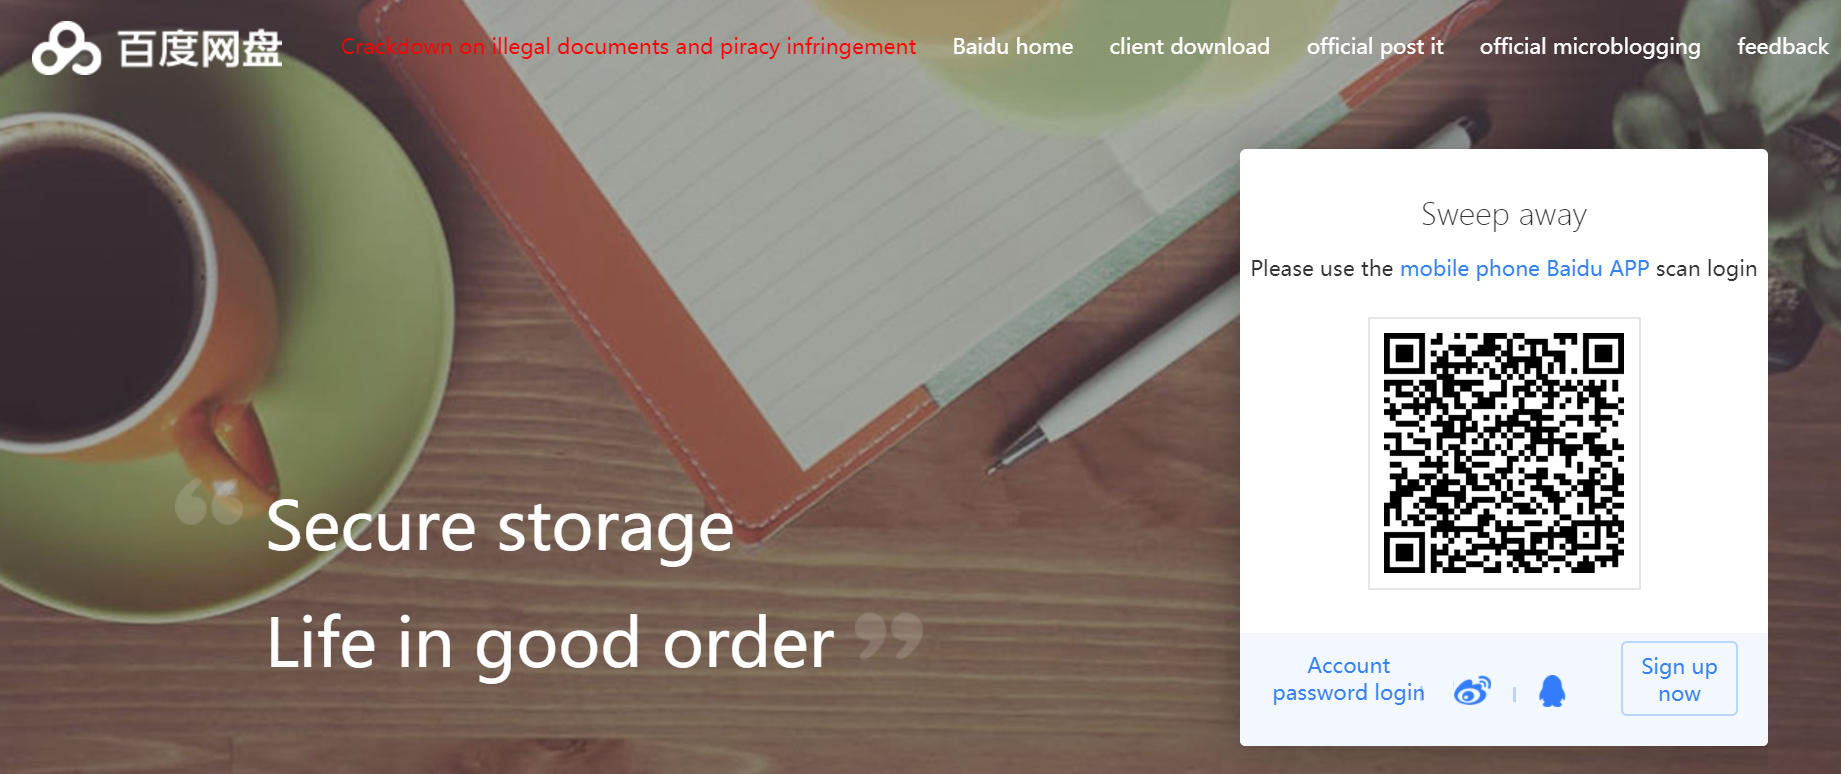 2-TB-Free-Cloud-Storage-Baidu